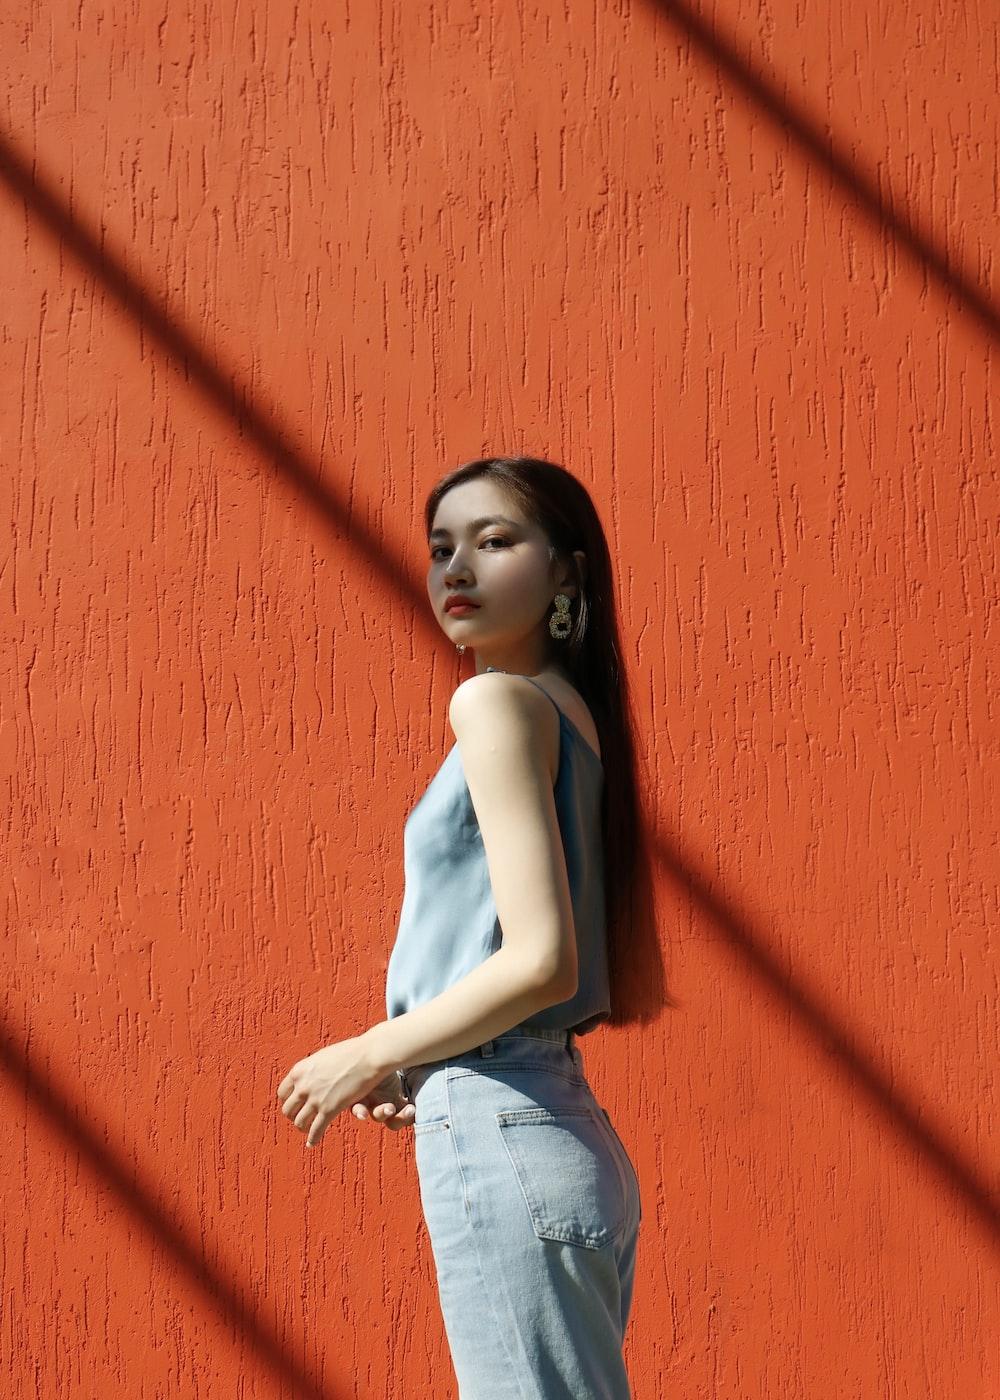 woman in blue top standing beside wall